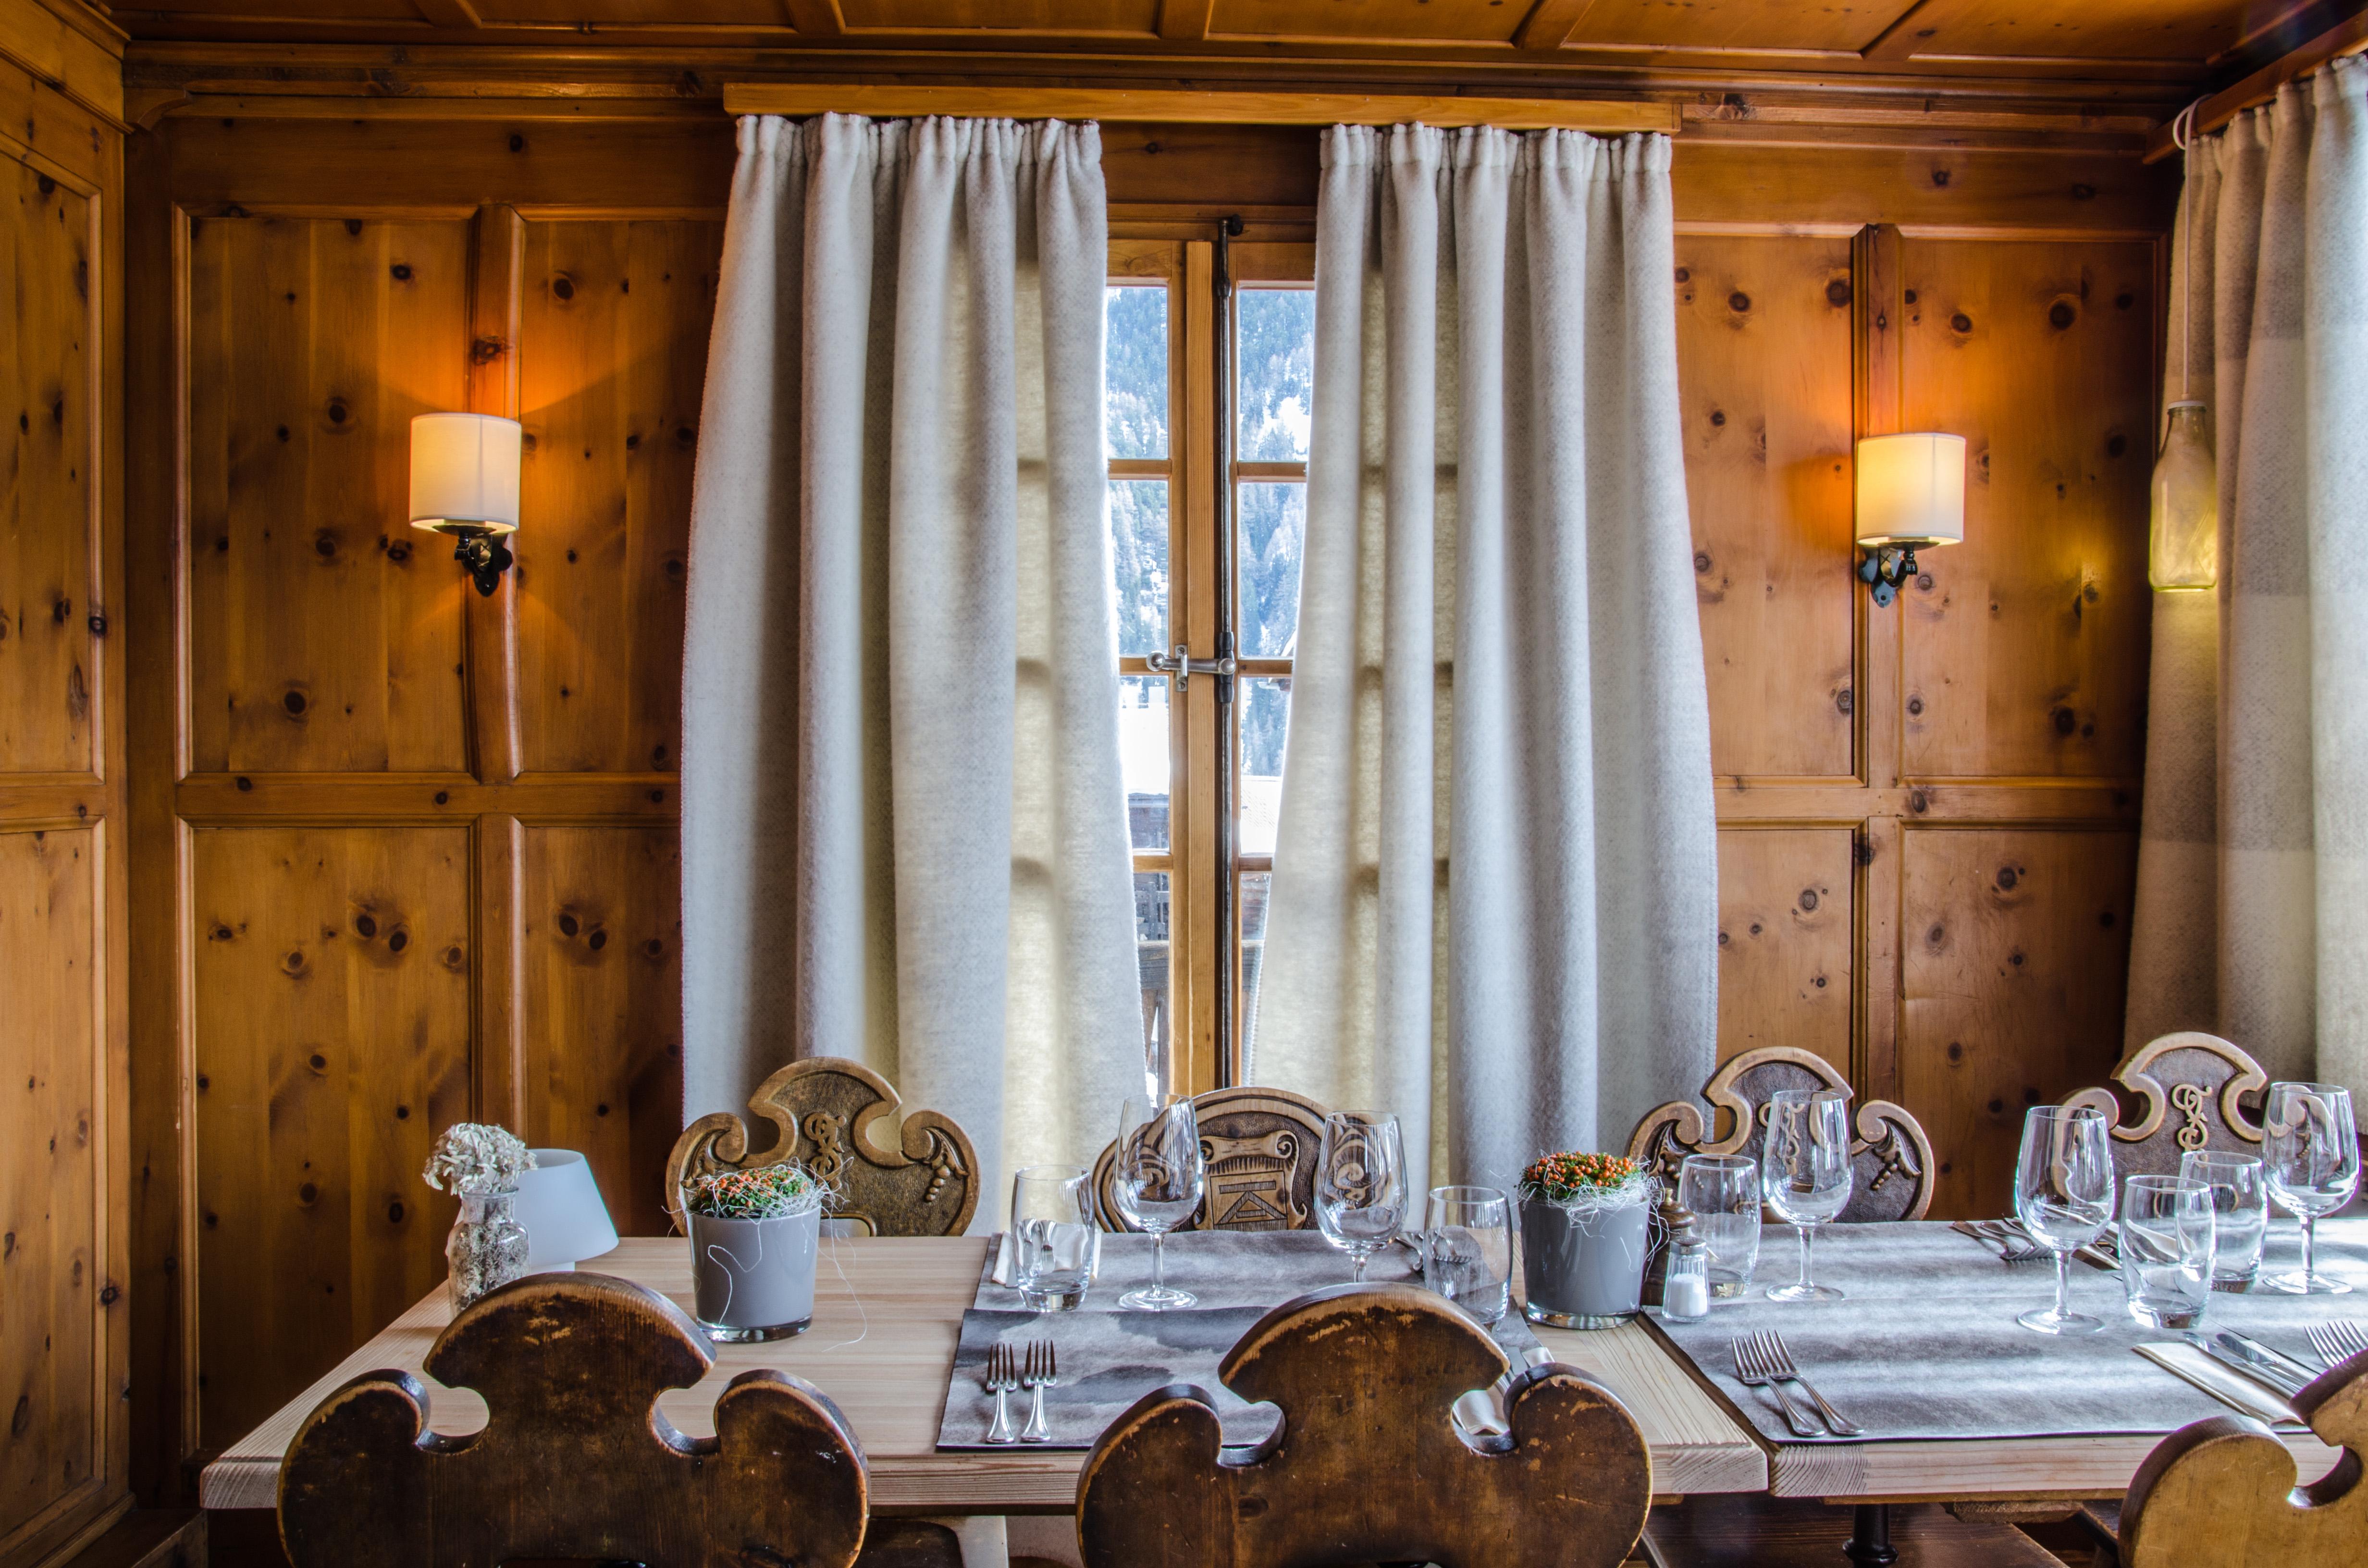 7-Chalet_favre_restaurant